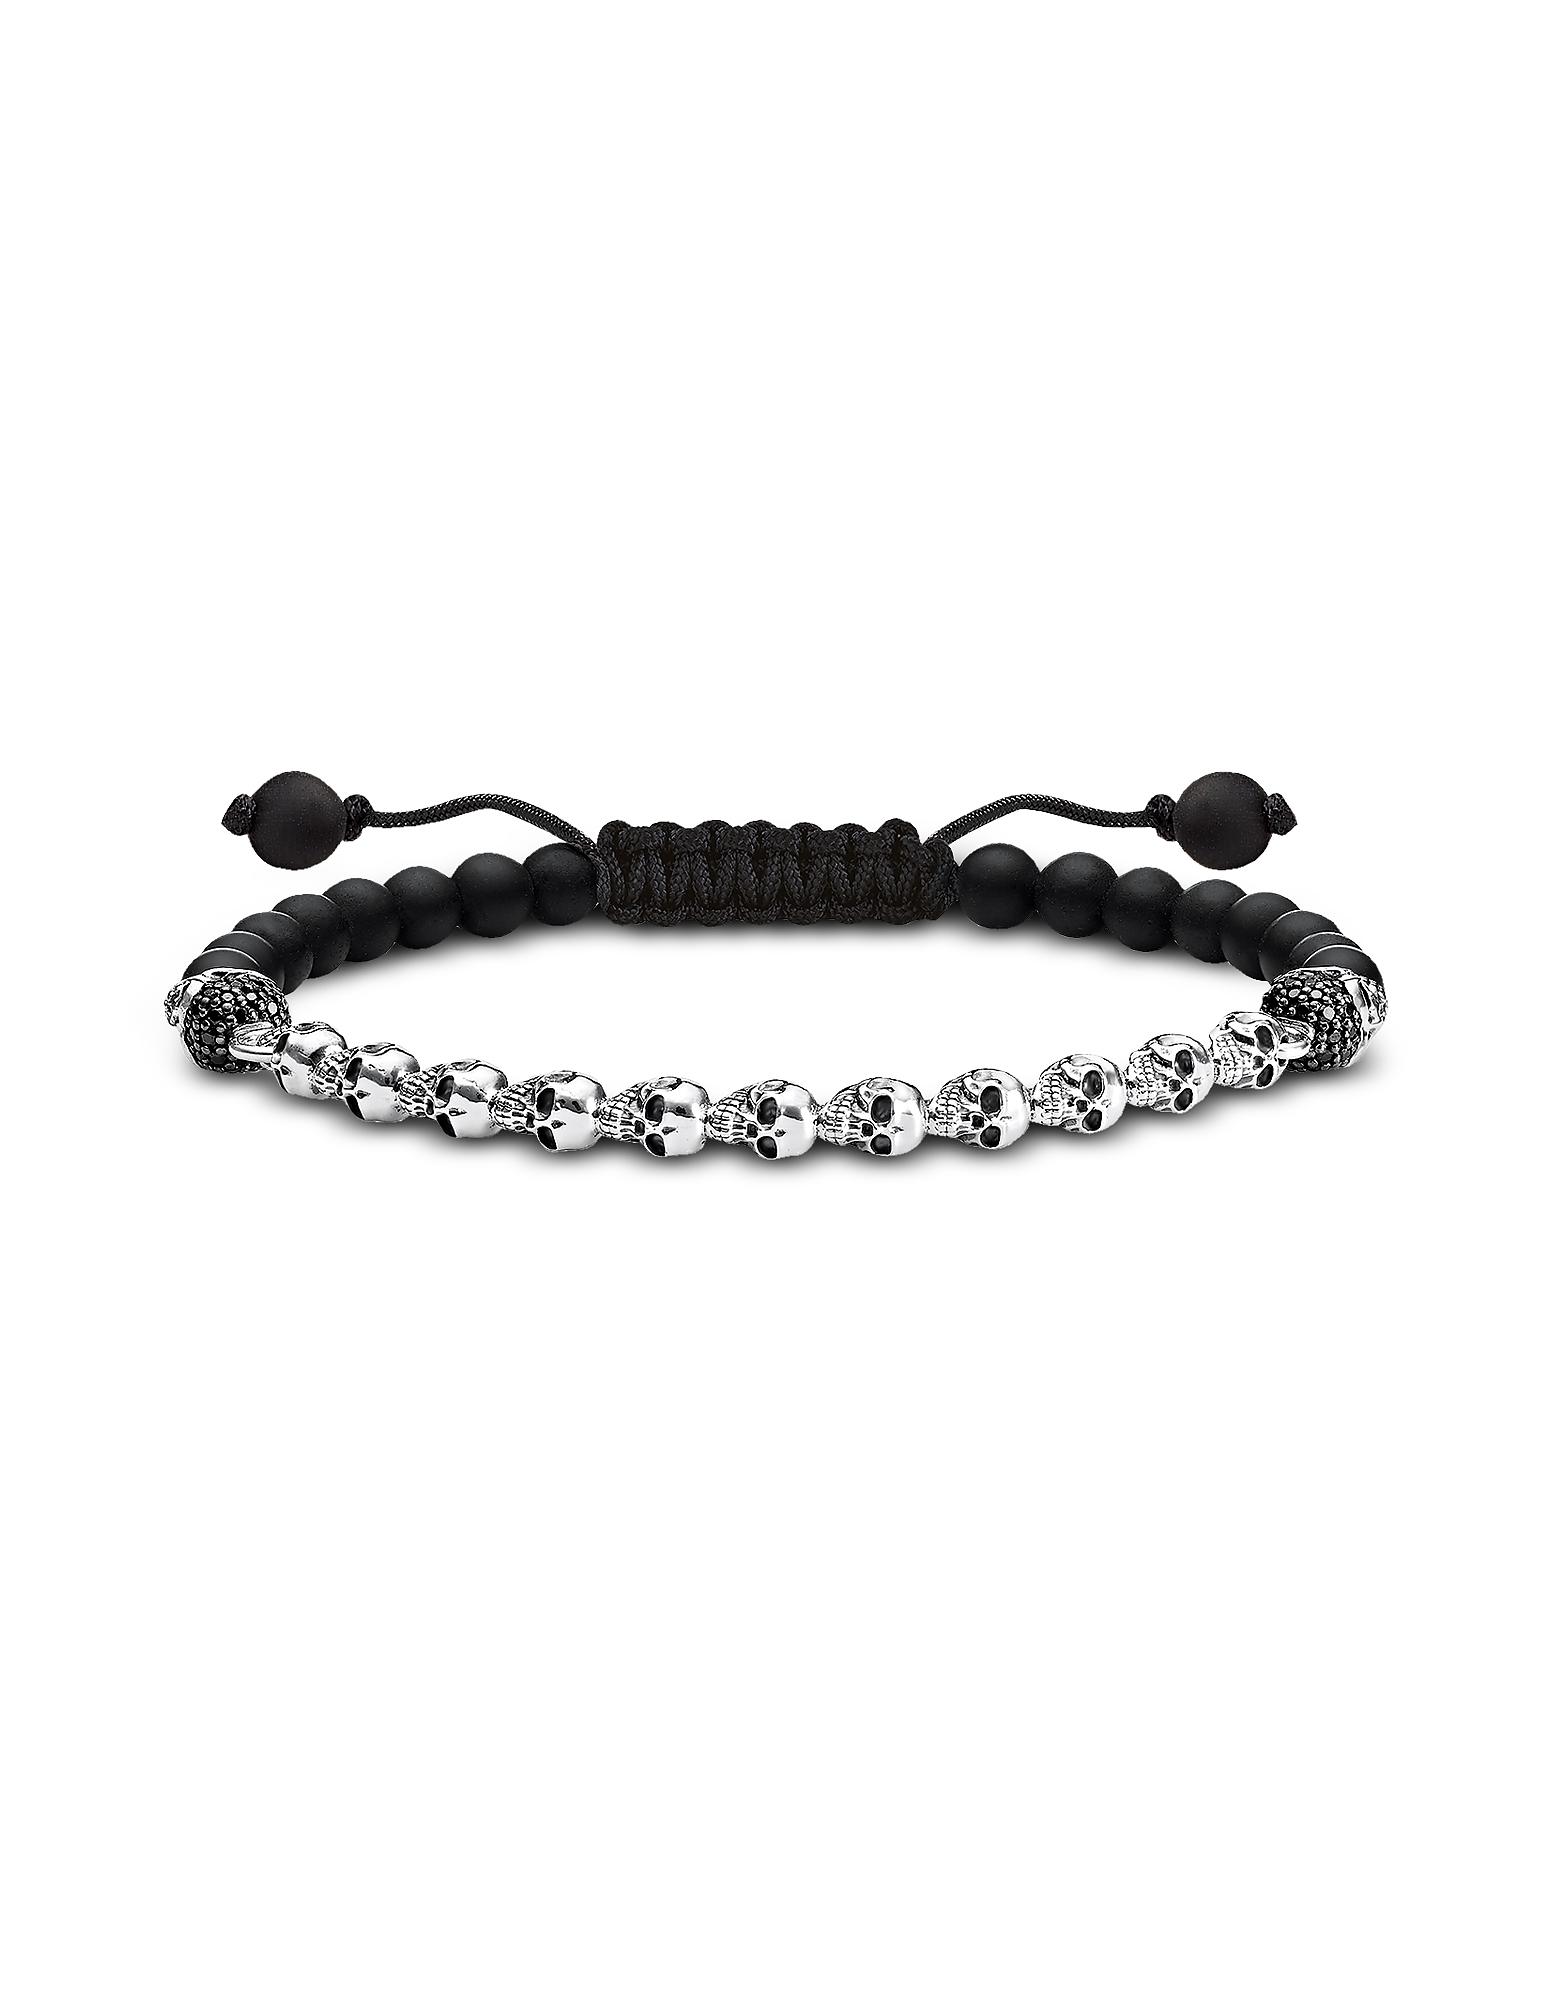 Thomas Sabo Bracelets, Blackened 925 Sterling Silver, Black Obsidian & Zirconia Skulls Bracelet